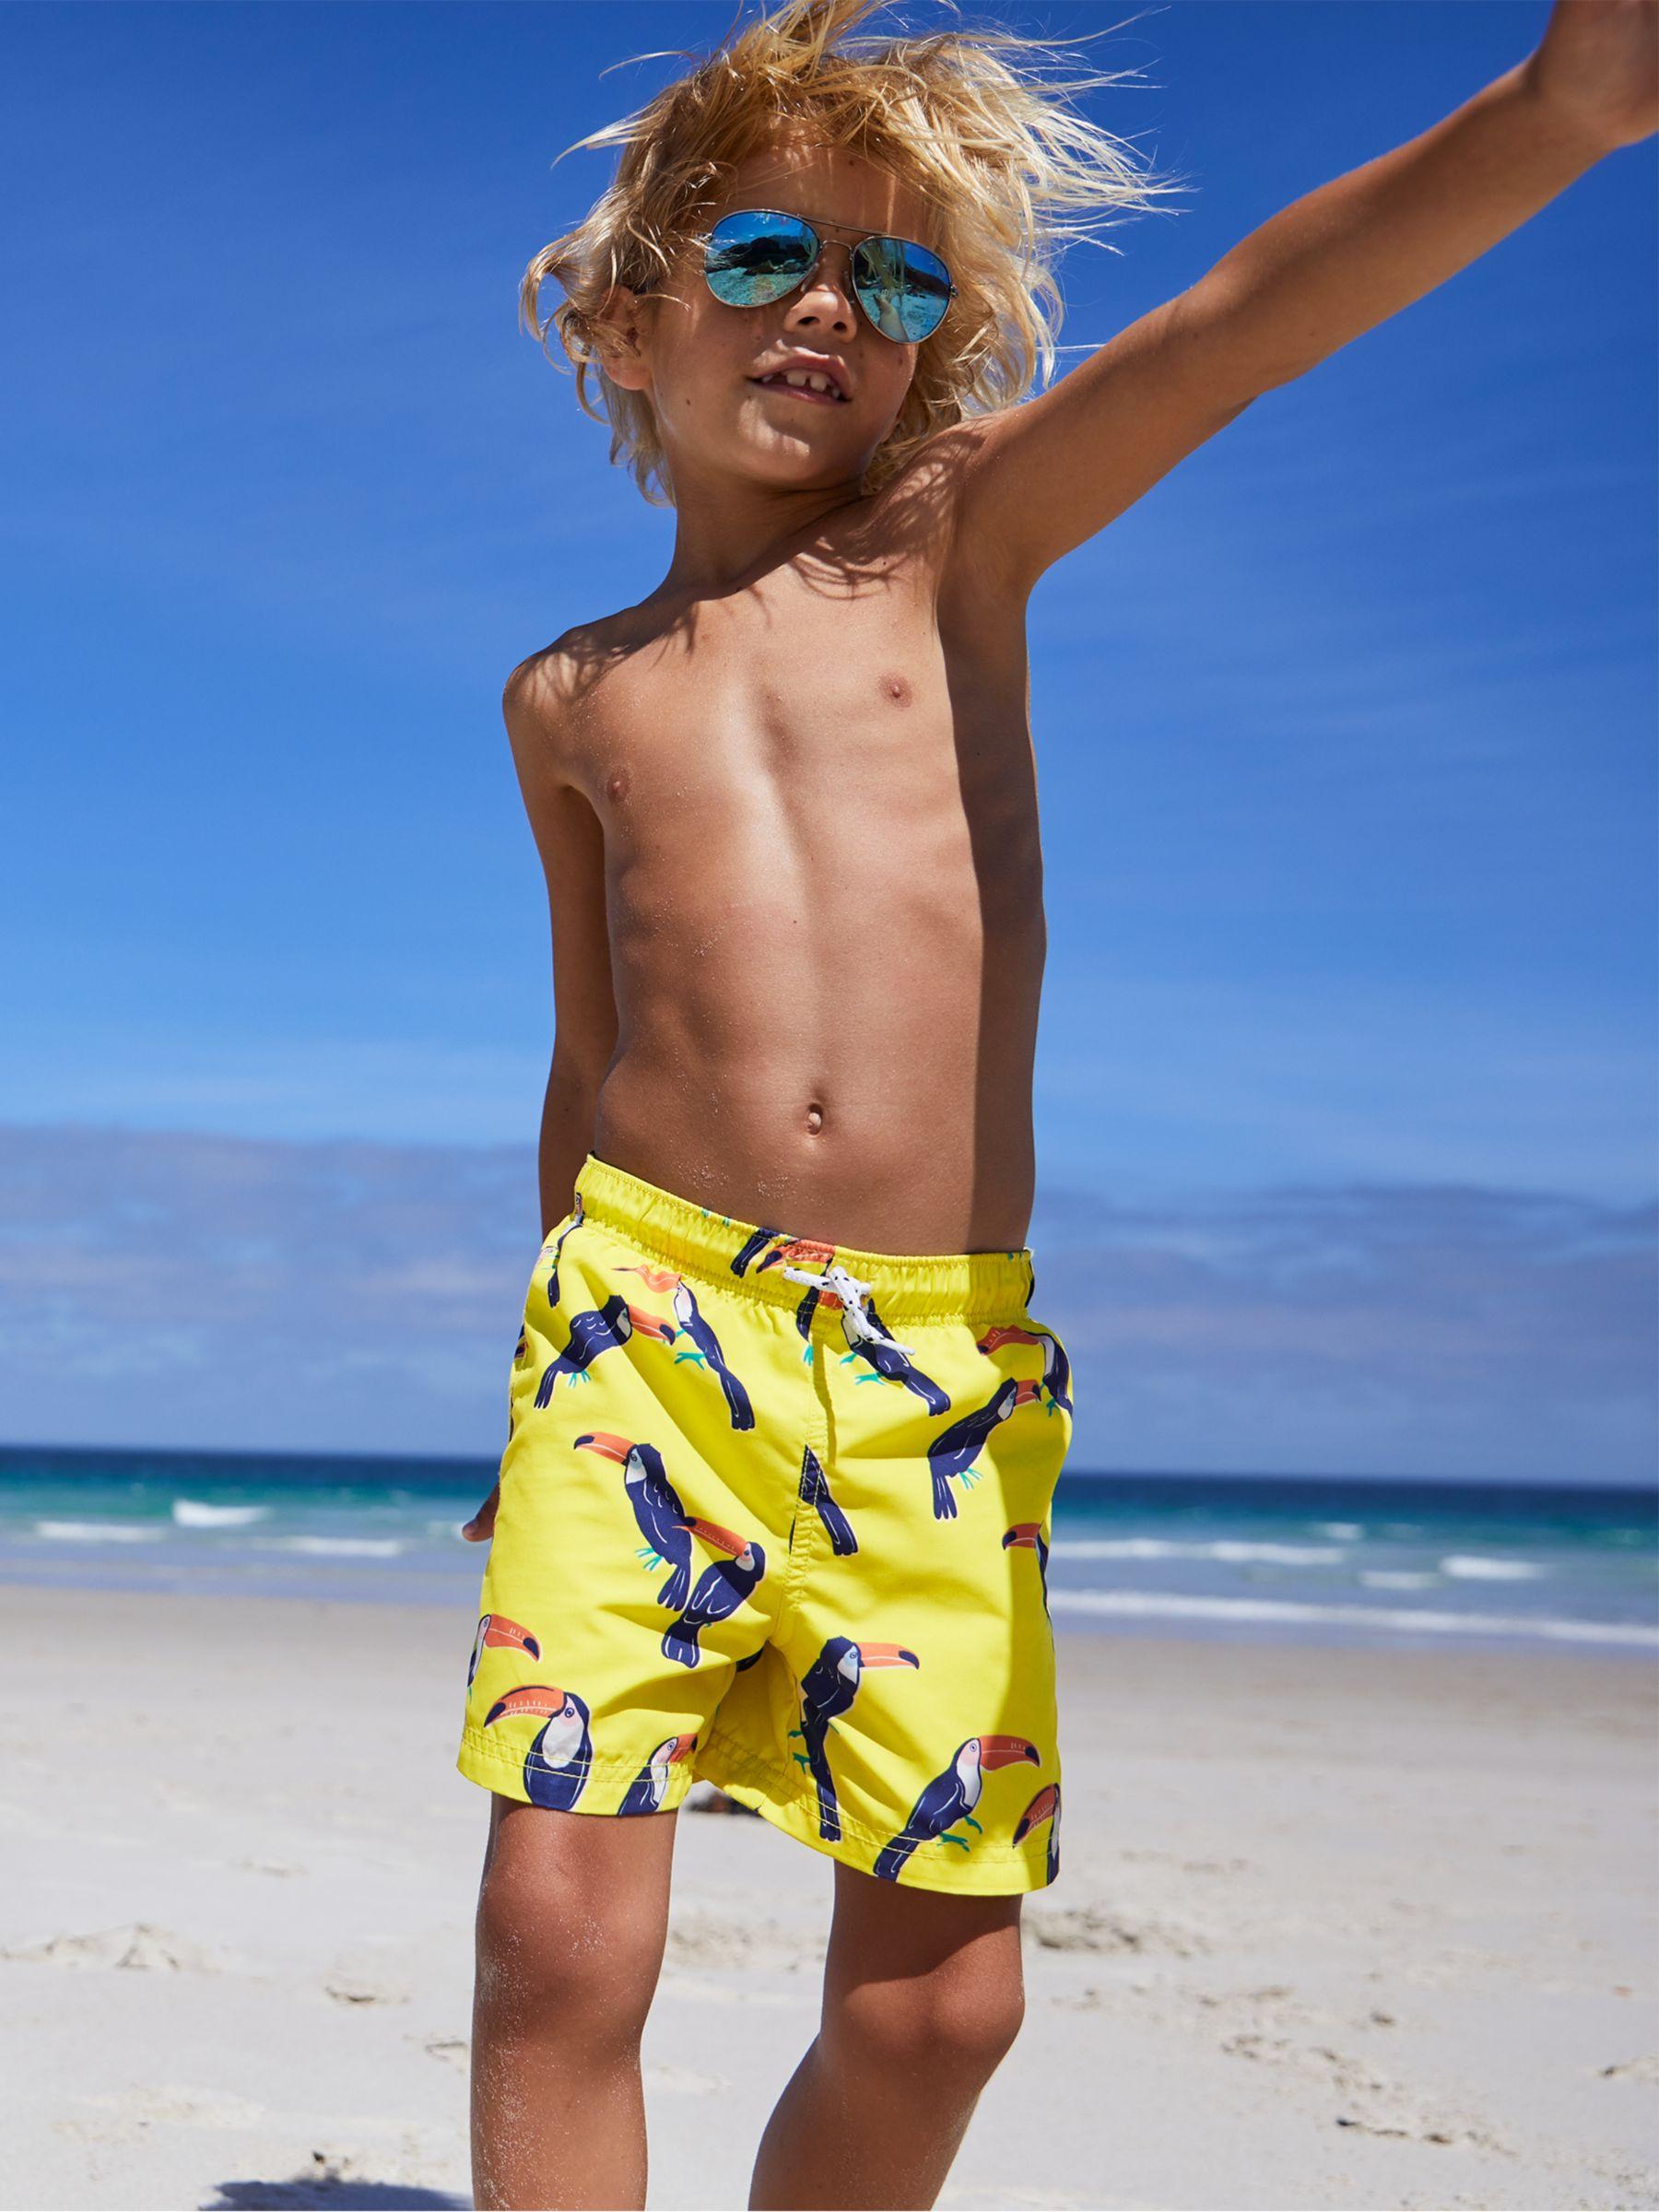 df1eda2e5b021 Mini Boden Boys' Bathers Swimming Shorts, Yellow Toucans at John ...